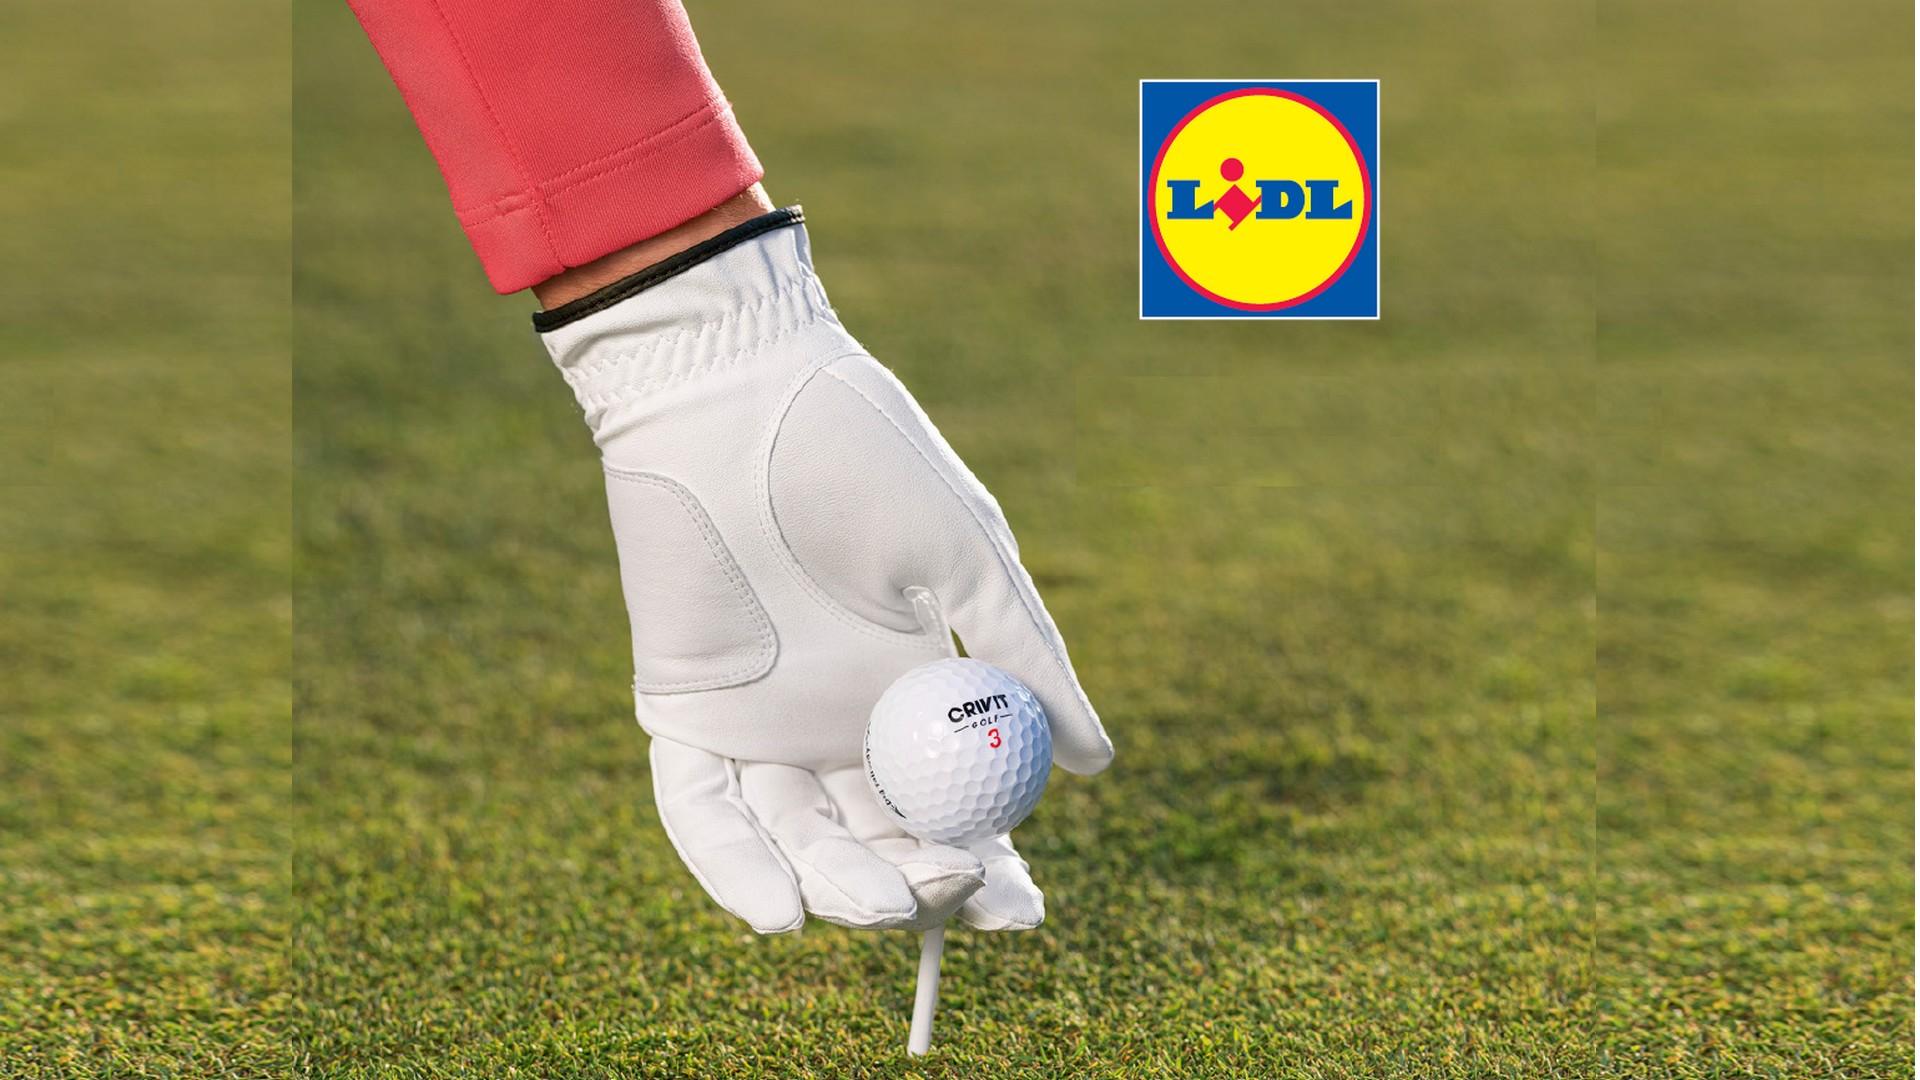 Lidl x golf (golf) 2021